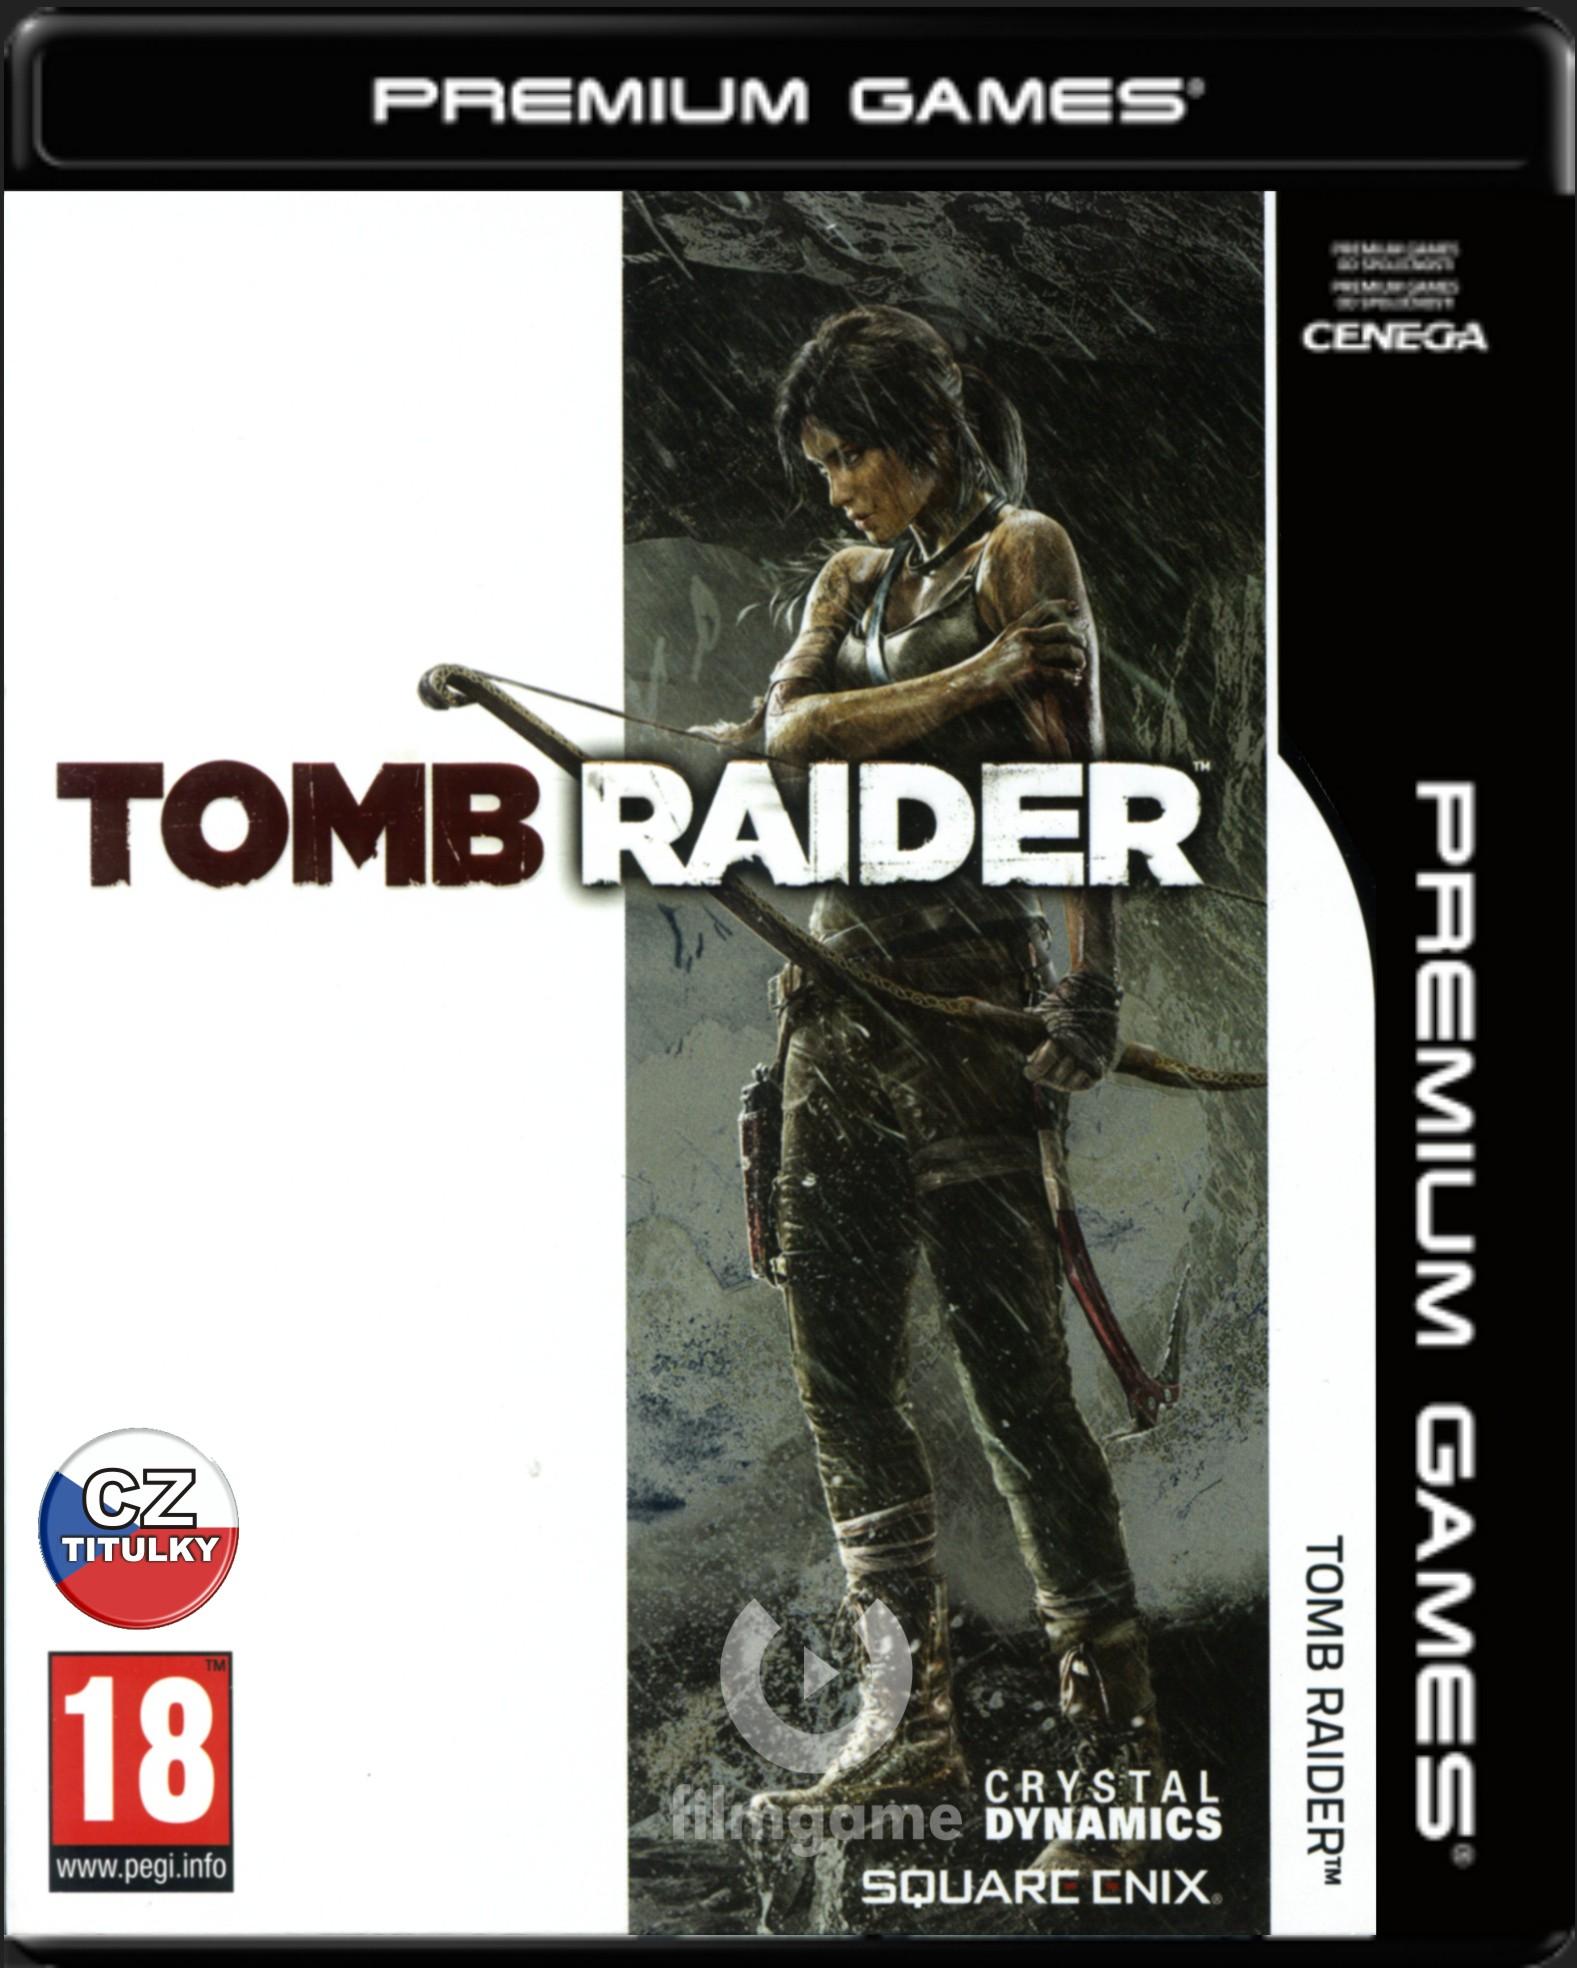 TOMB RAIDER (2013) - PC